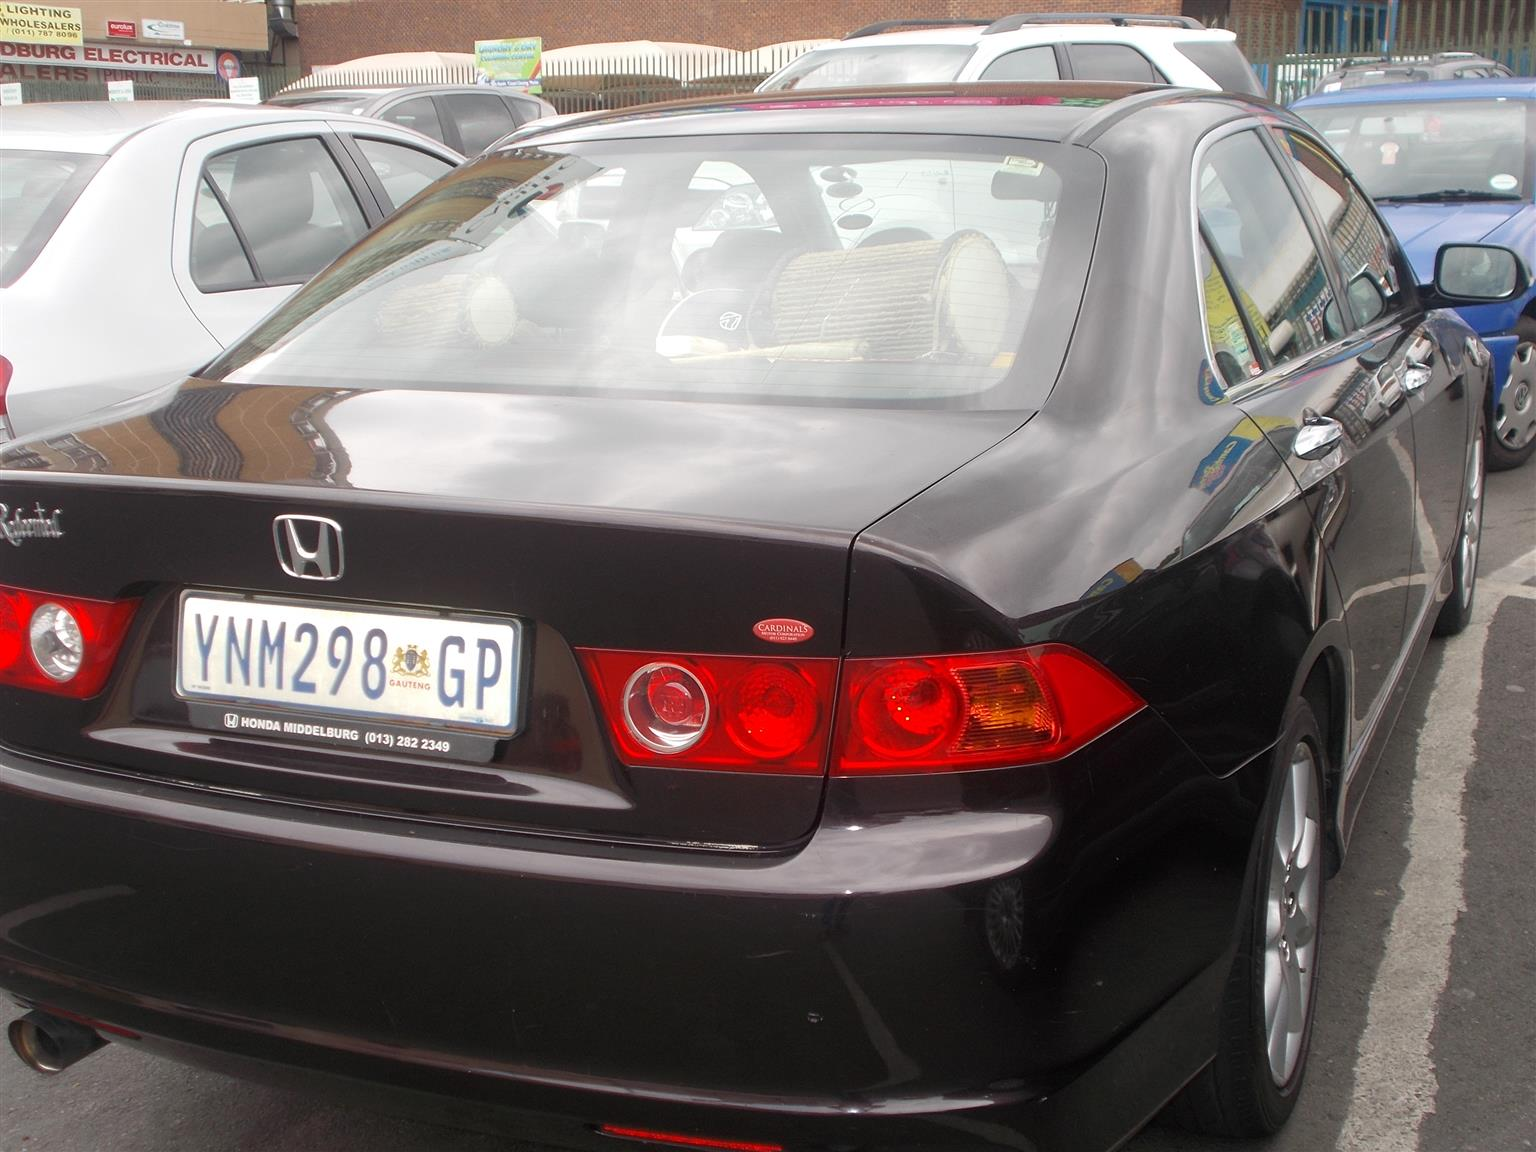 2006 Honda Accord 2.4 Executive automatic